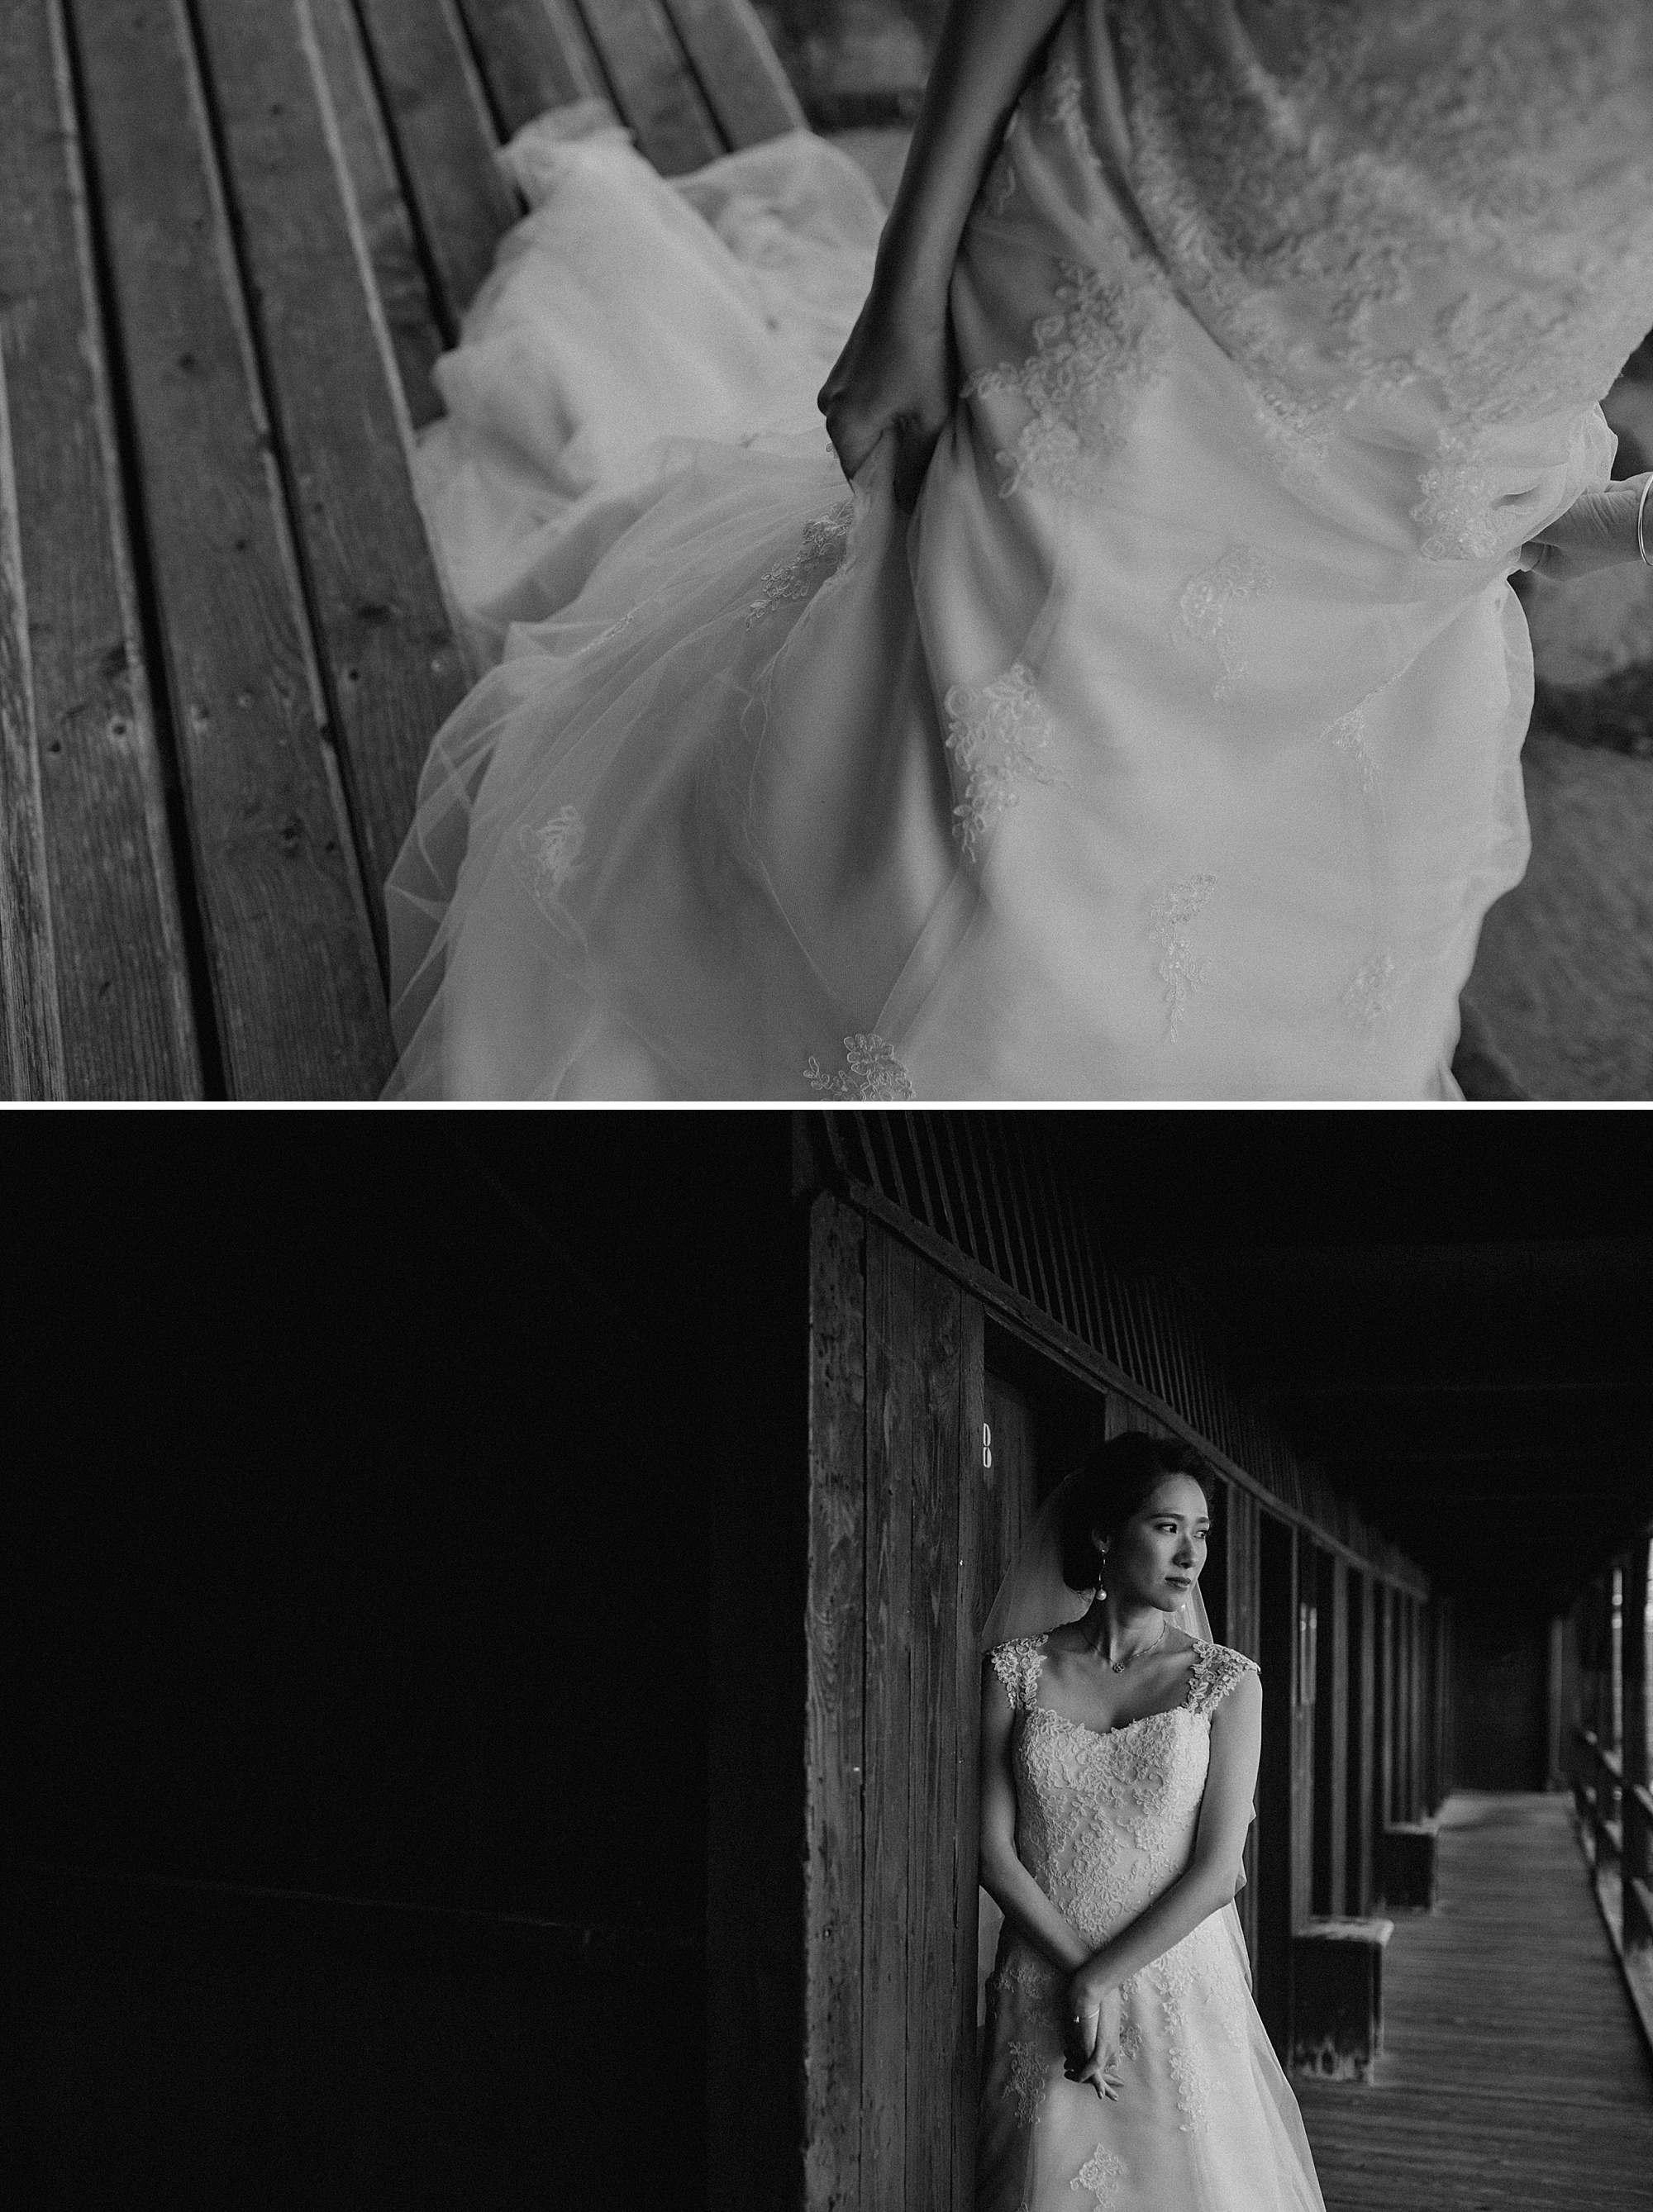 kitzbuehel wedding photographer_0064.jpg